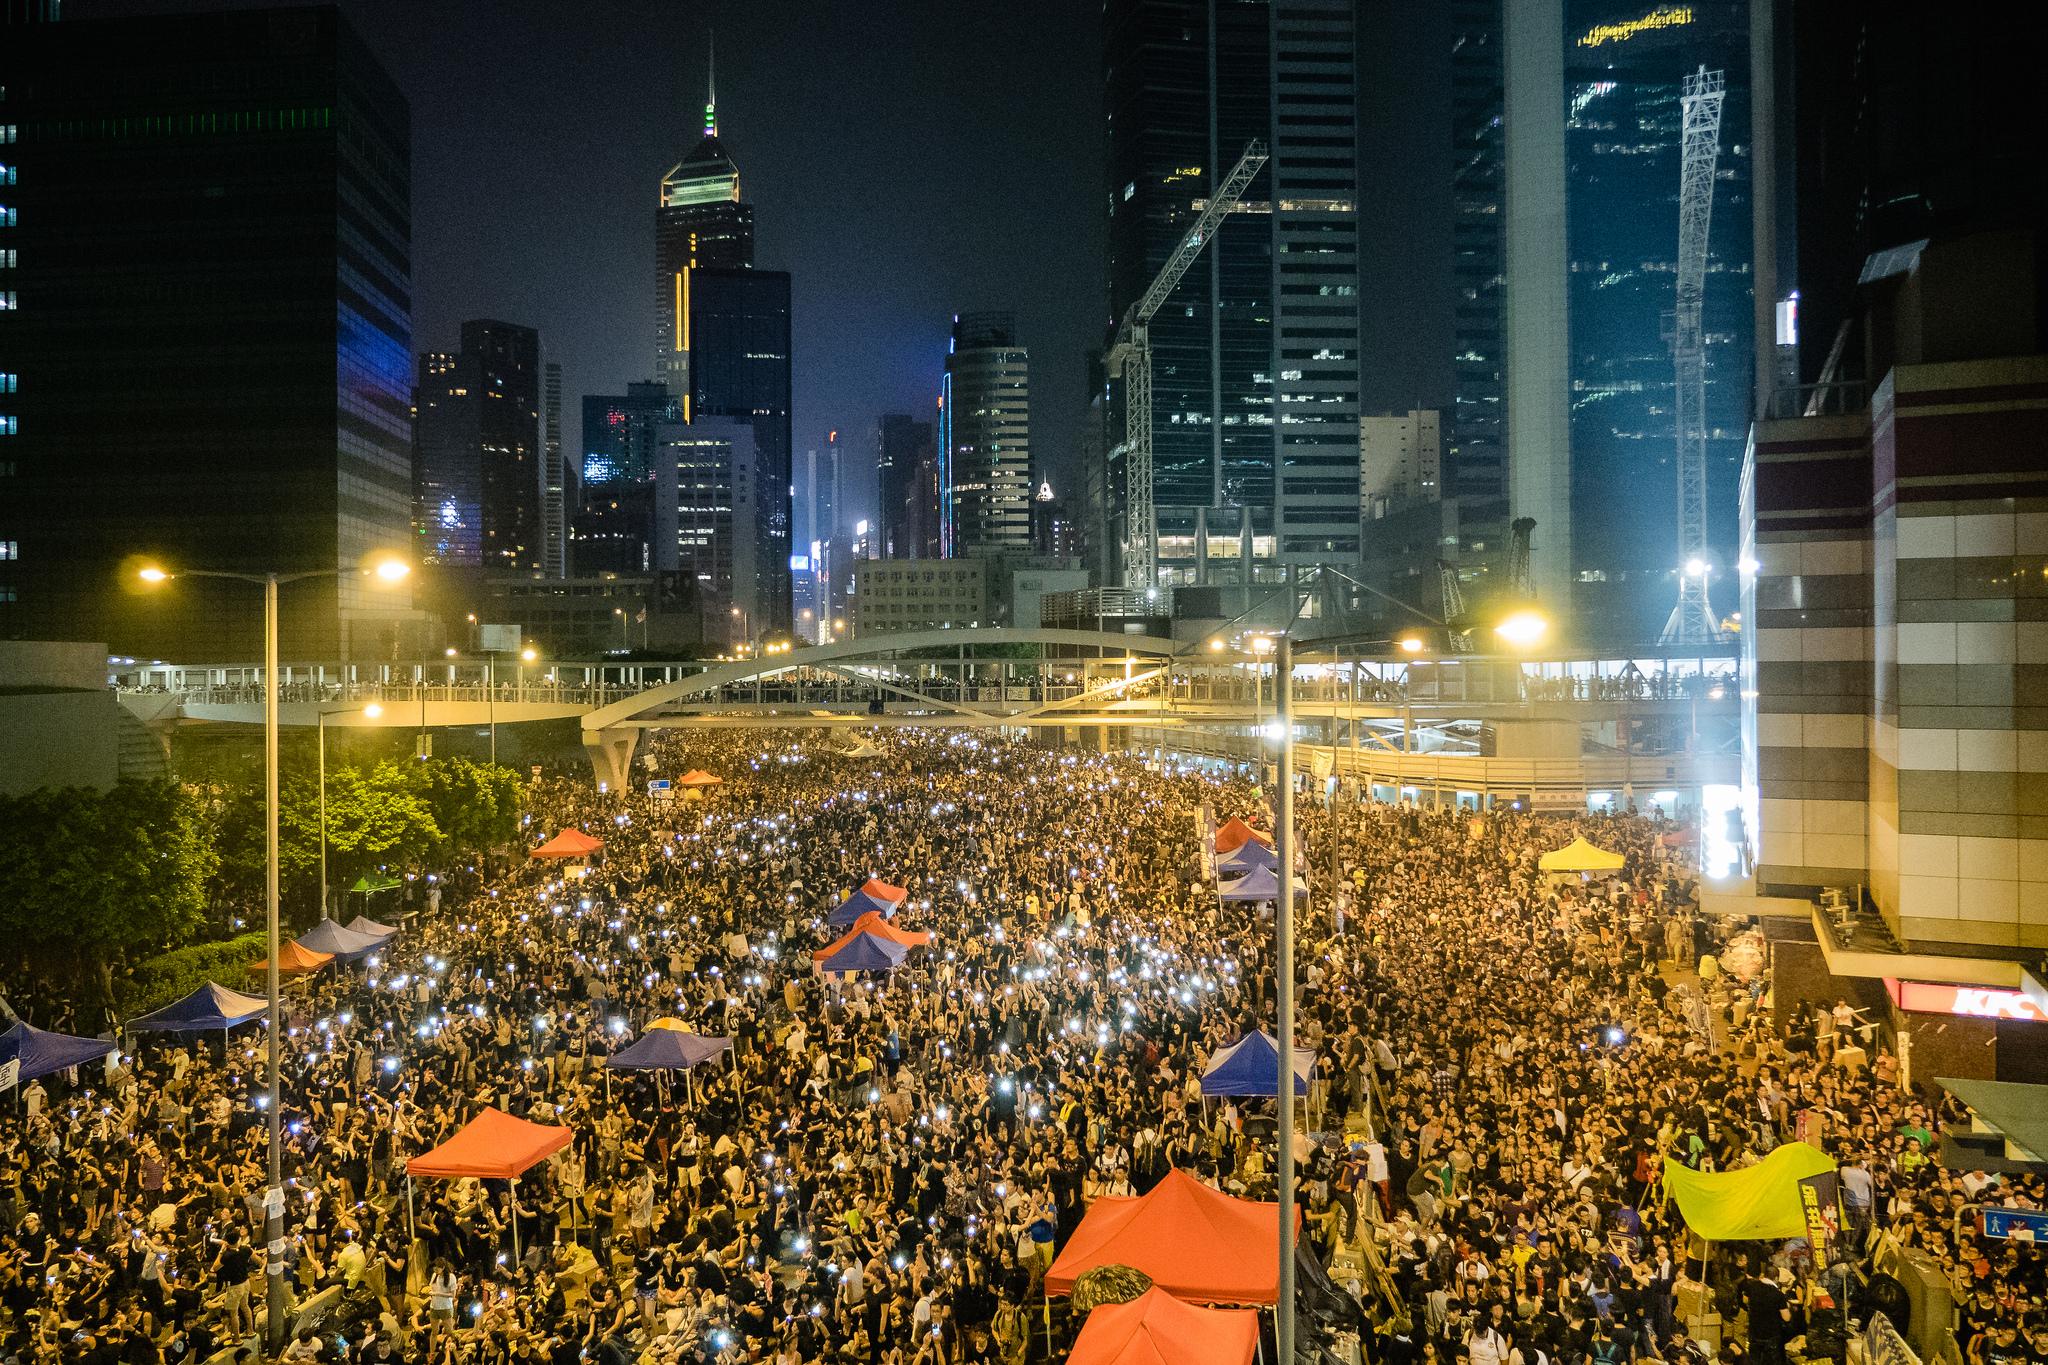 Image:   Hong Kong's Umbrella Revolution         by Studio Incendo     CC BY 2.0